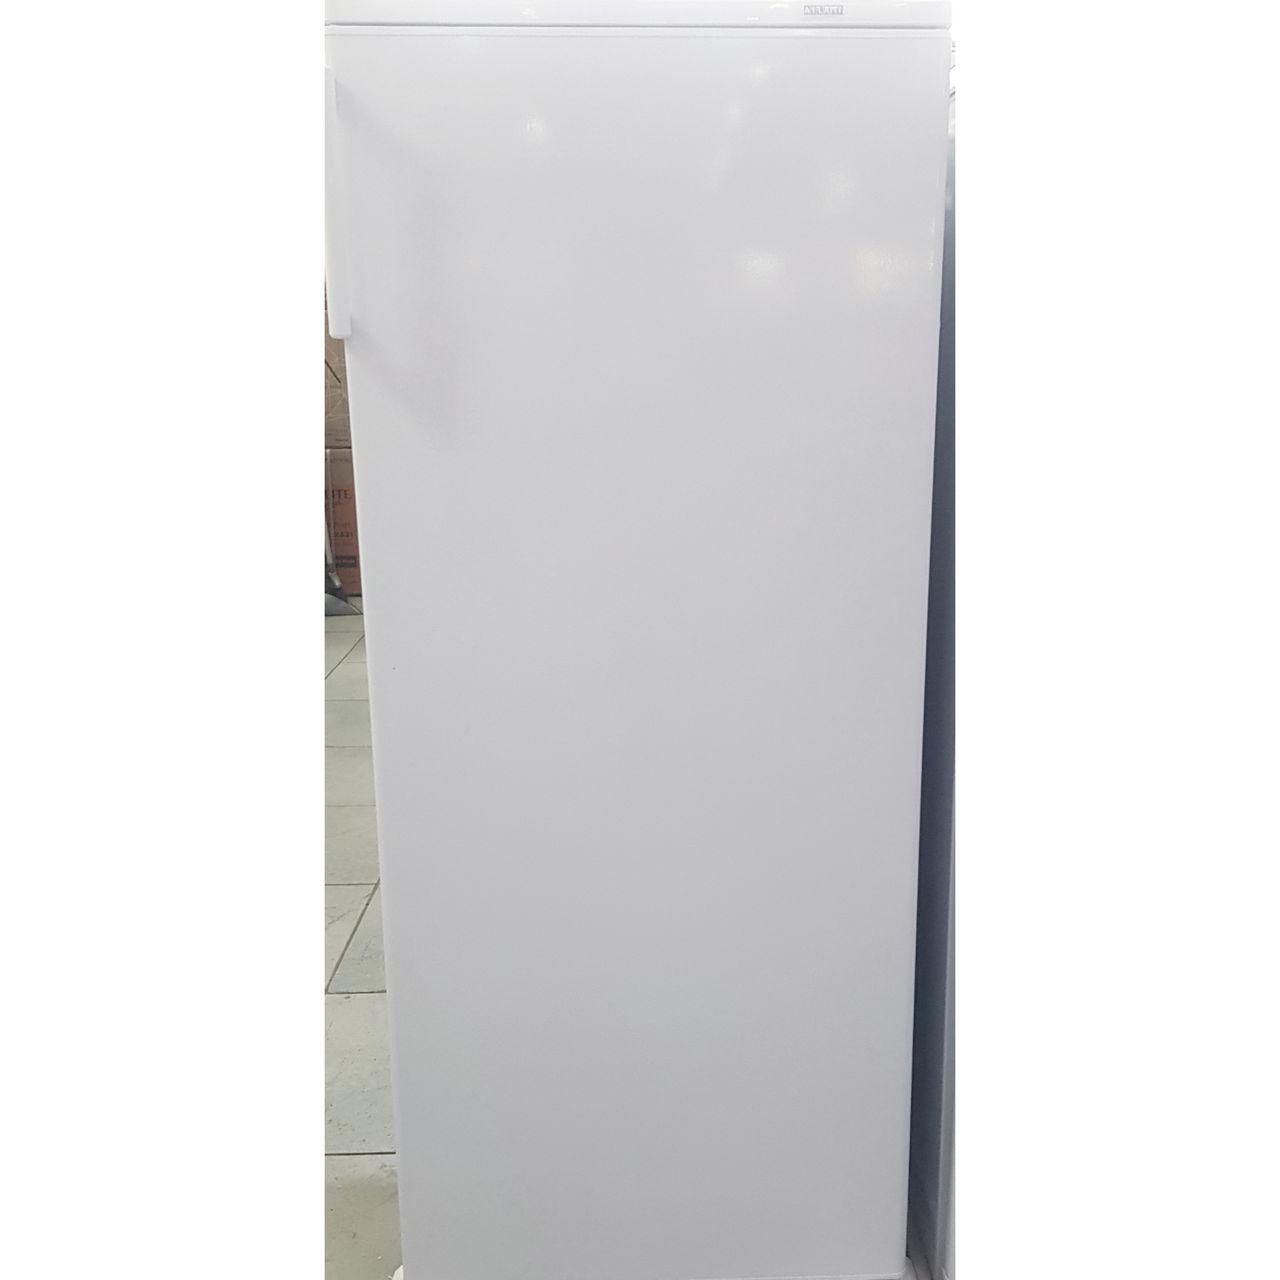 Холодильник однокамерный Atlant MX-5810-62 280 л